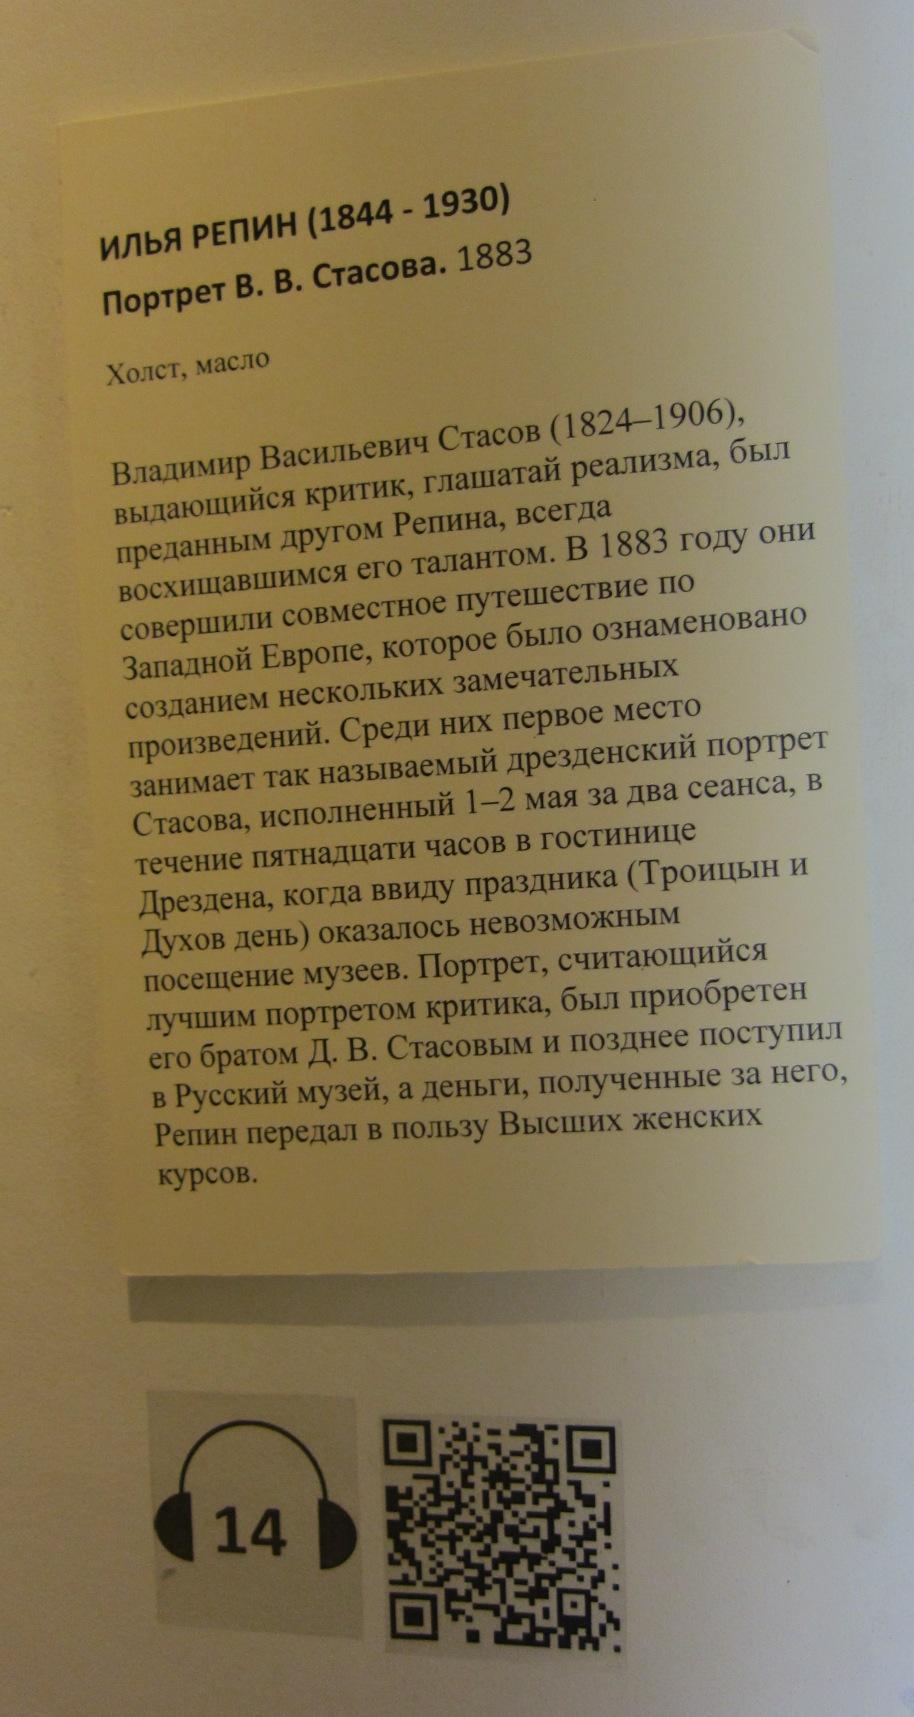 Описание картины Стасова, QR-код иномер трека аудиогида